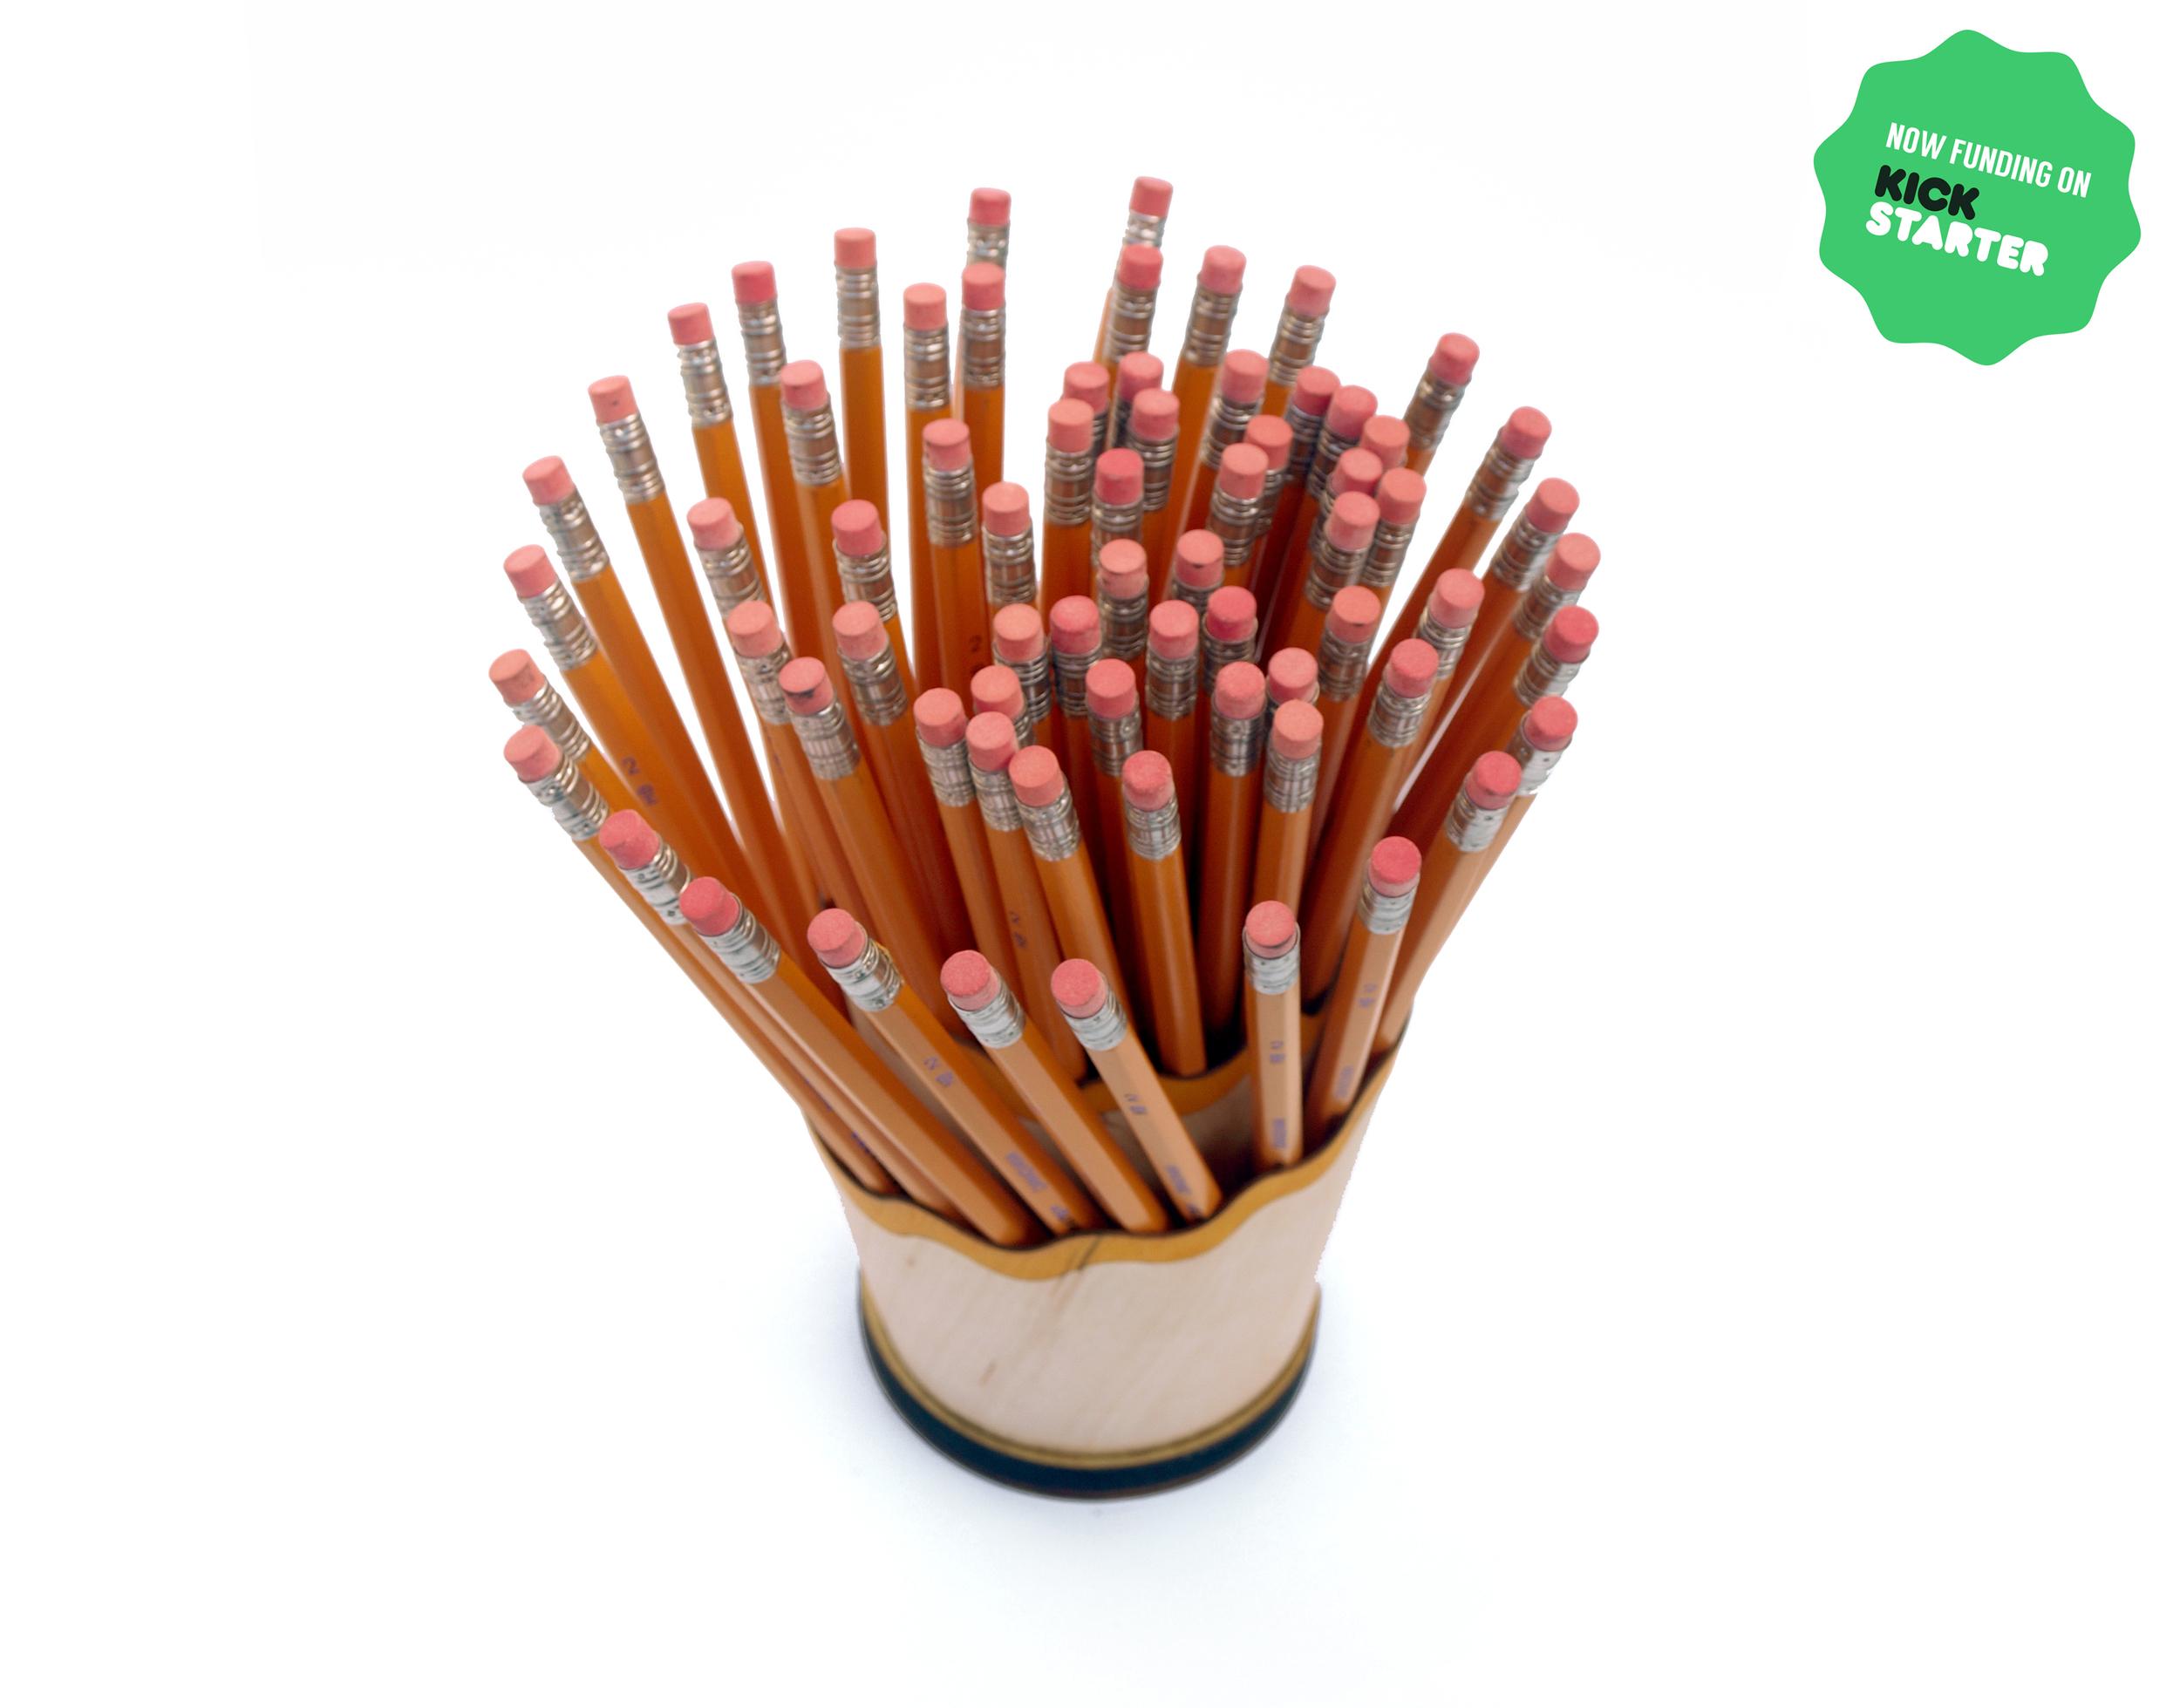 PencilShave_3_KSLogo.jpg